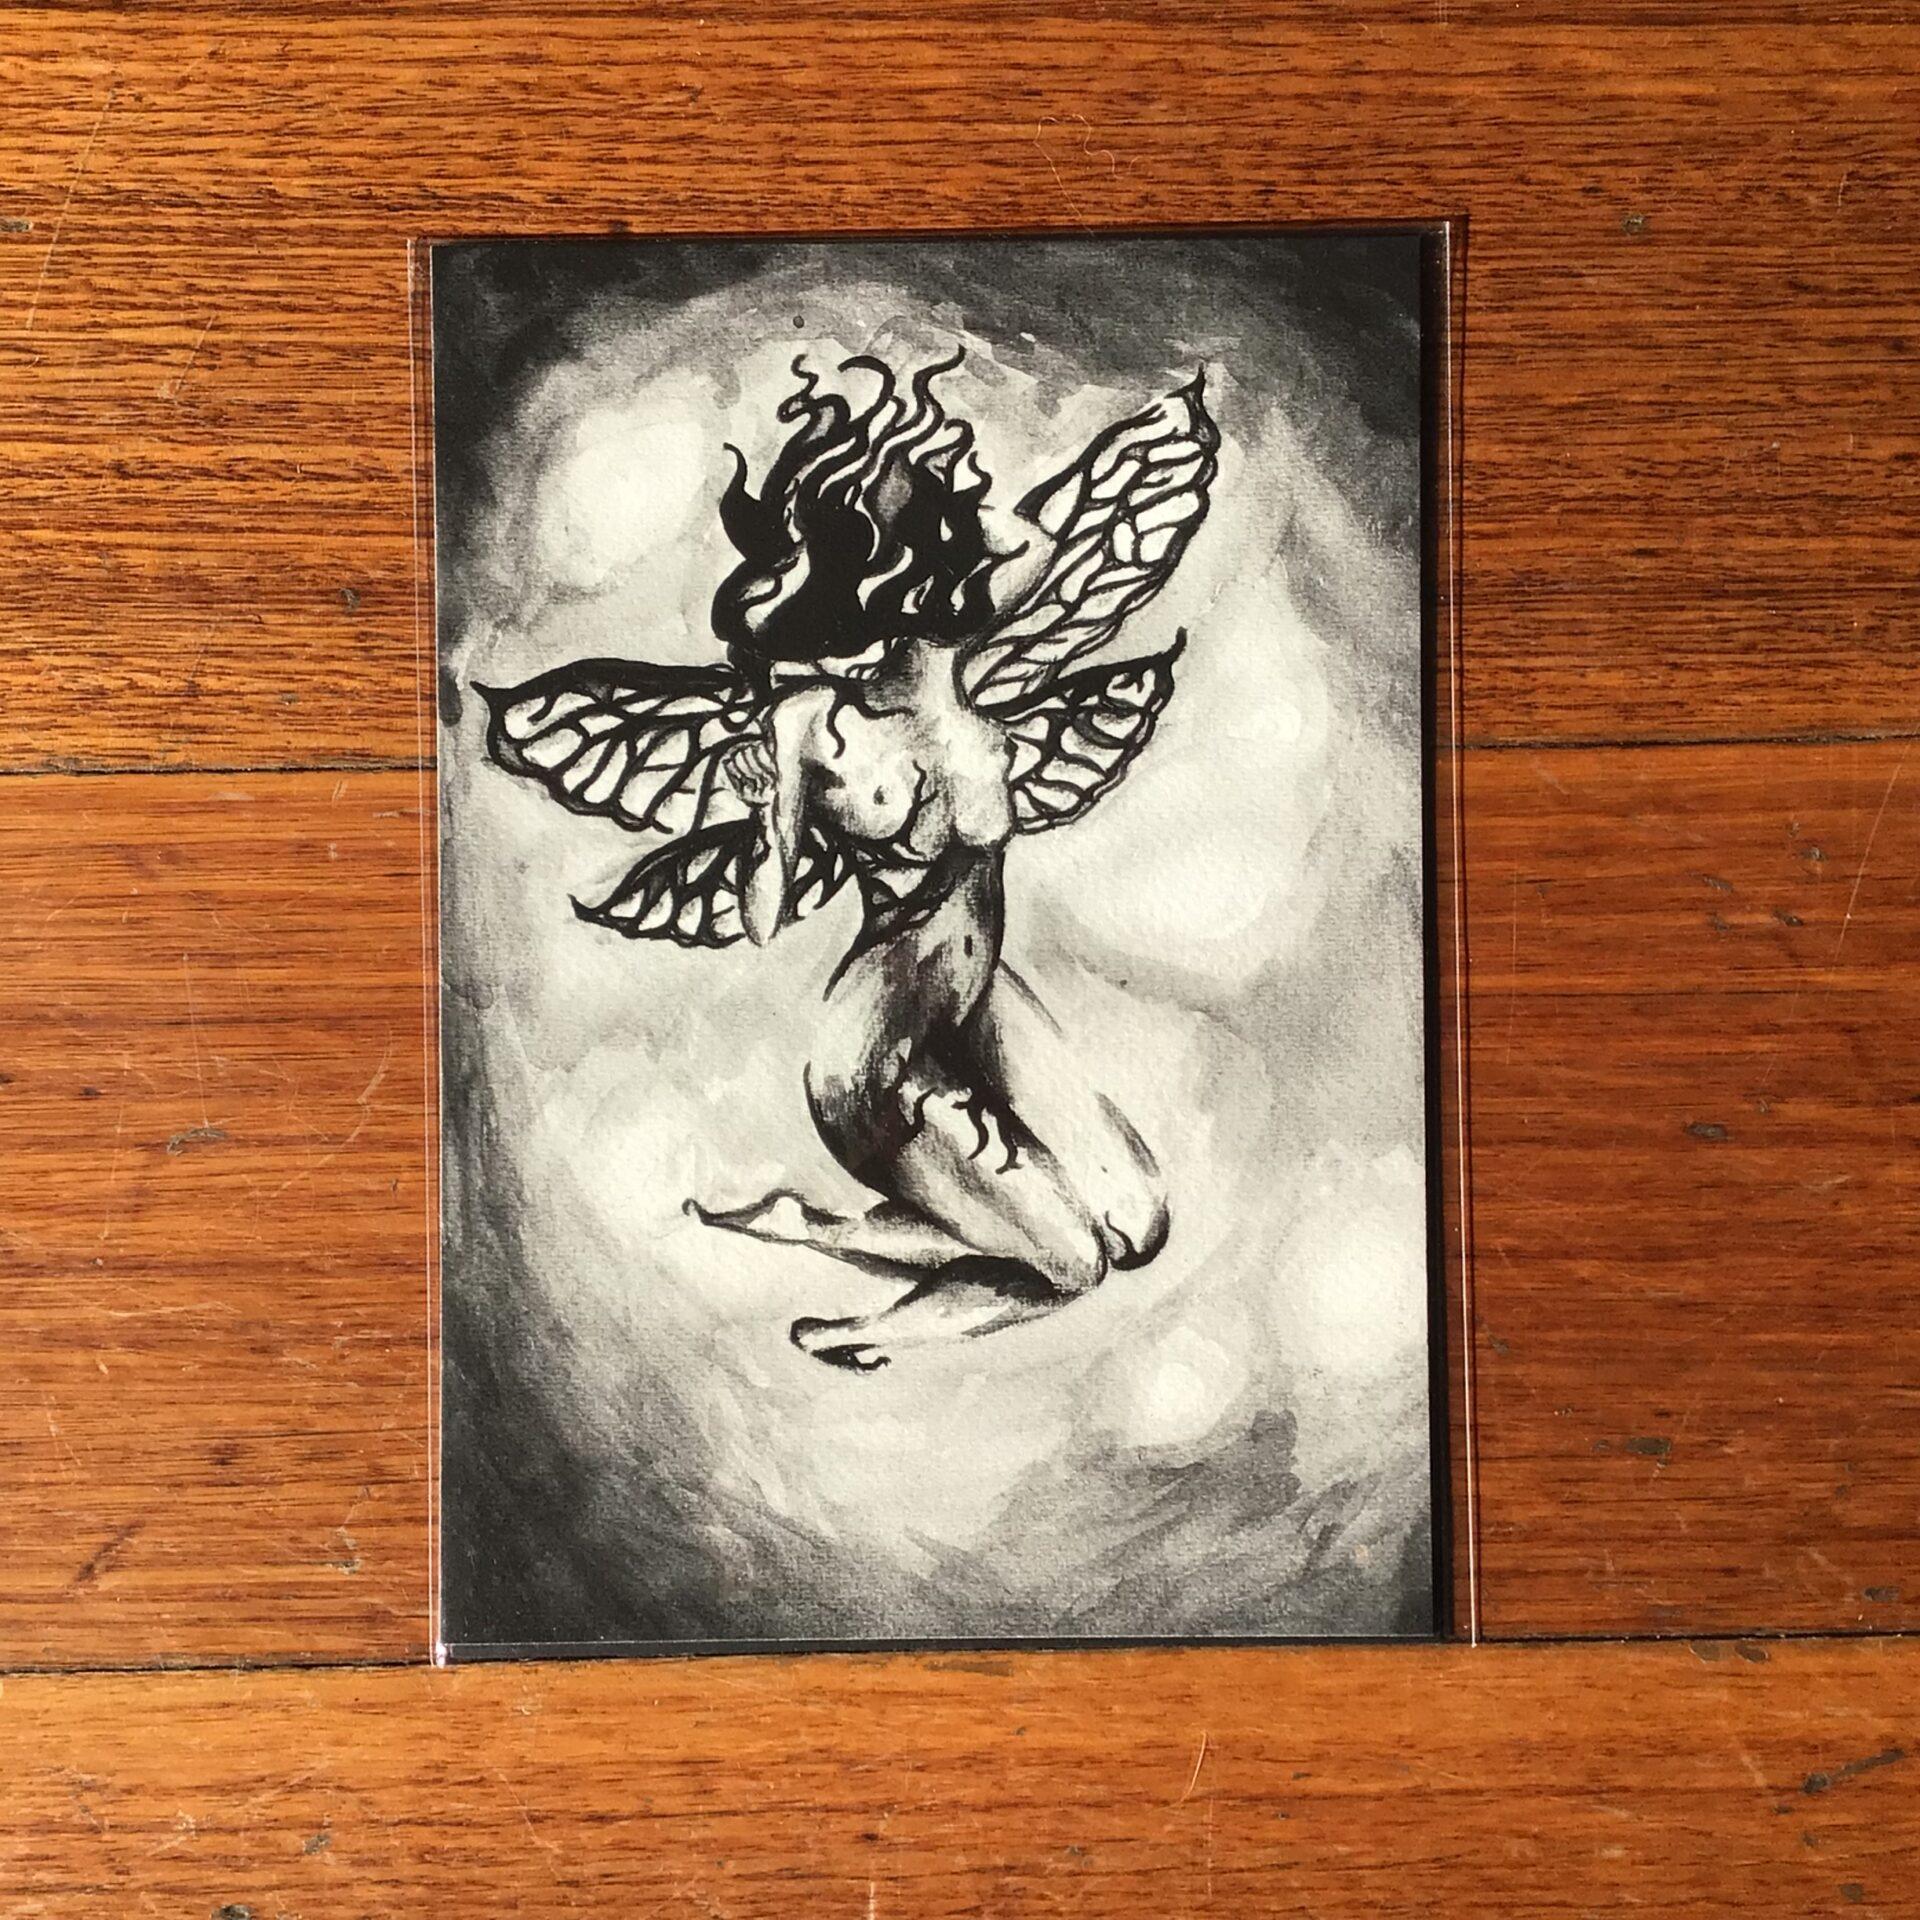 'Dark Fae', A5 Fine Art Print by Inktacled inktacled (Fitzroy)